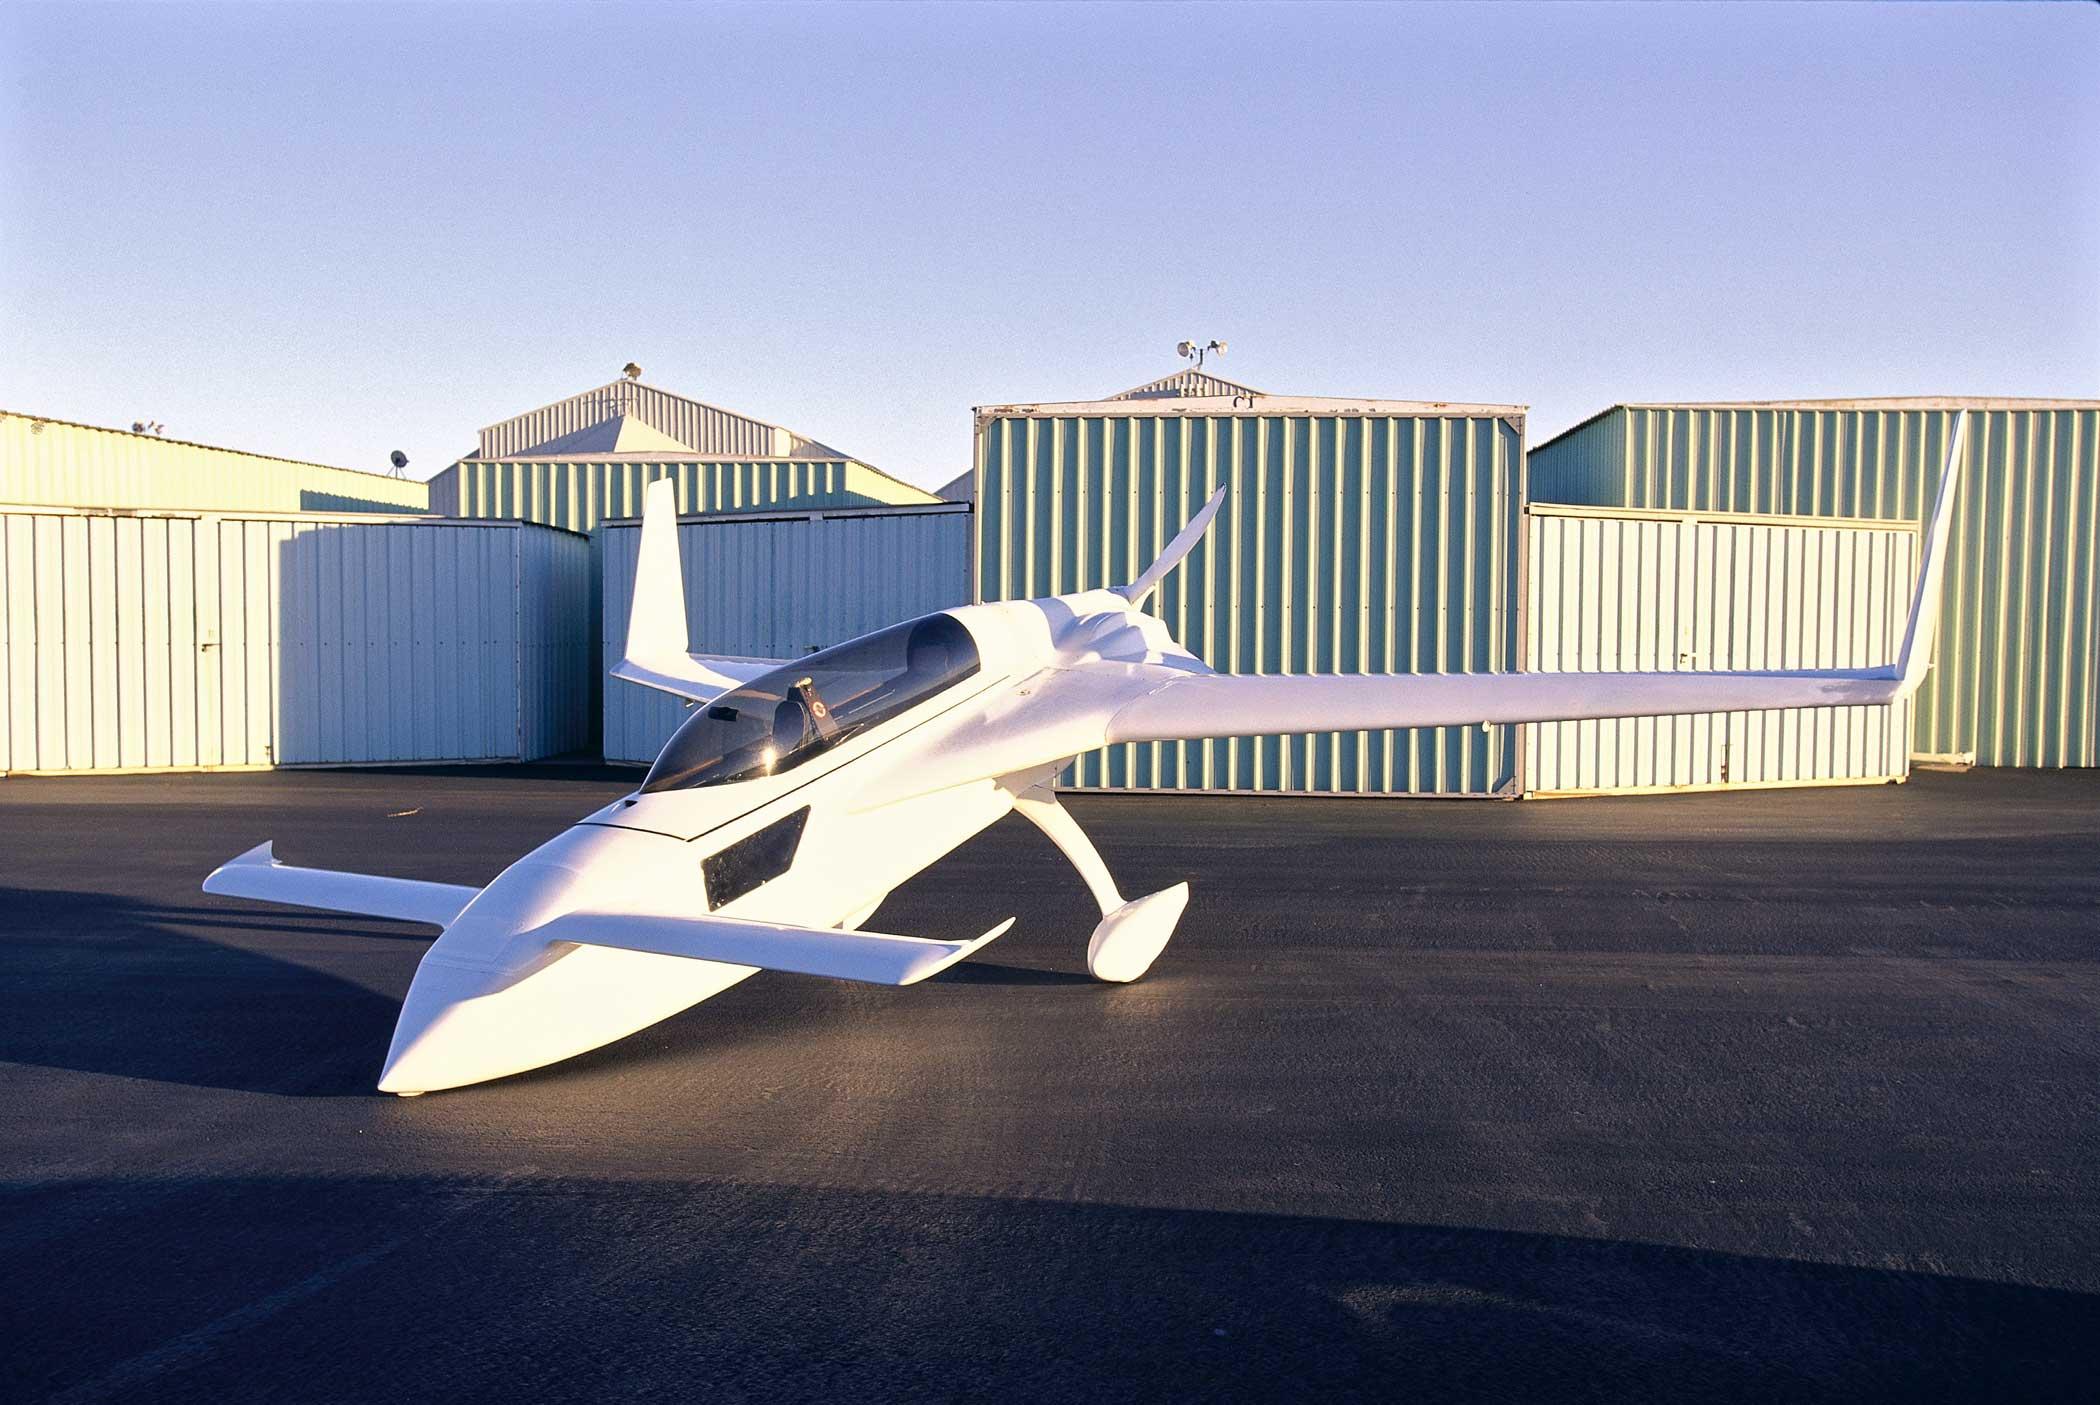 Aeronautical Engineer Burt Rutan's plane, the Long EZ sport plane on May 1982.